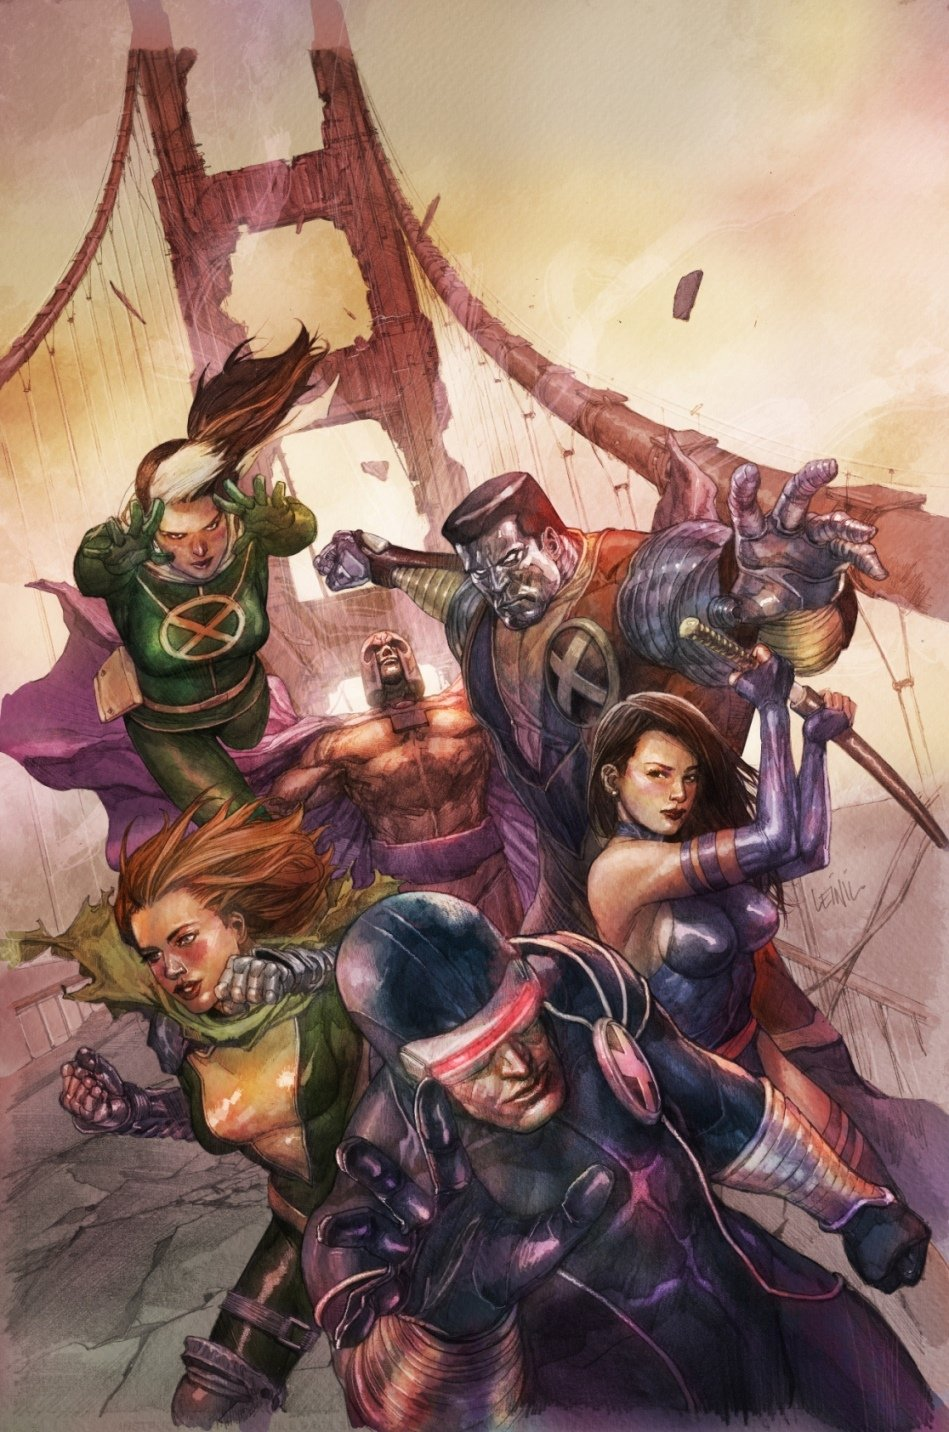 Leinil Francis Yu's artwork in The X-Men